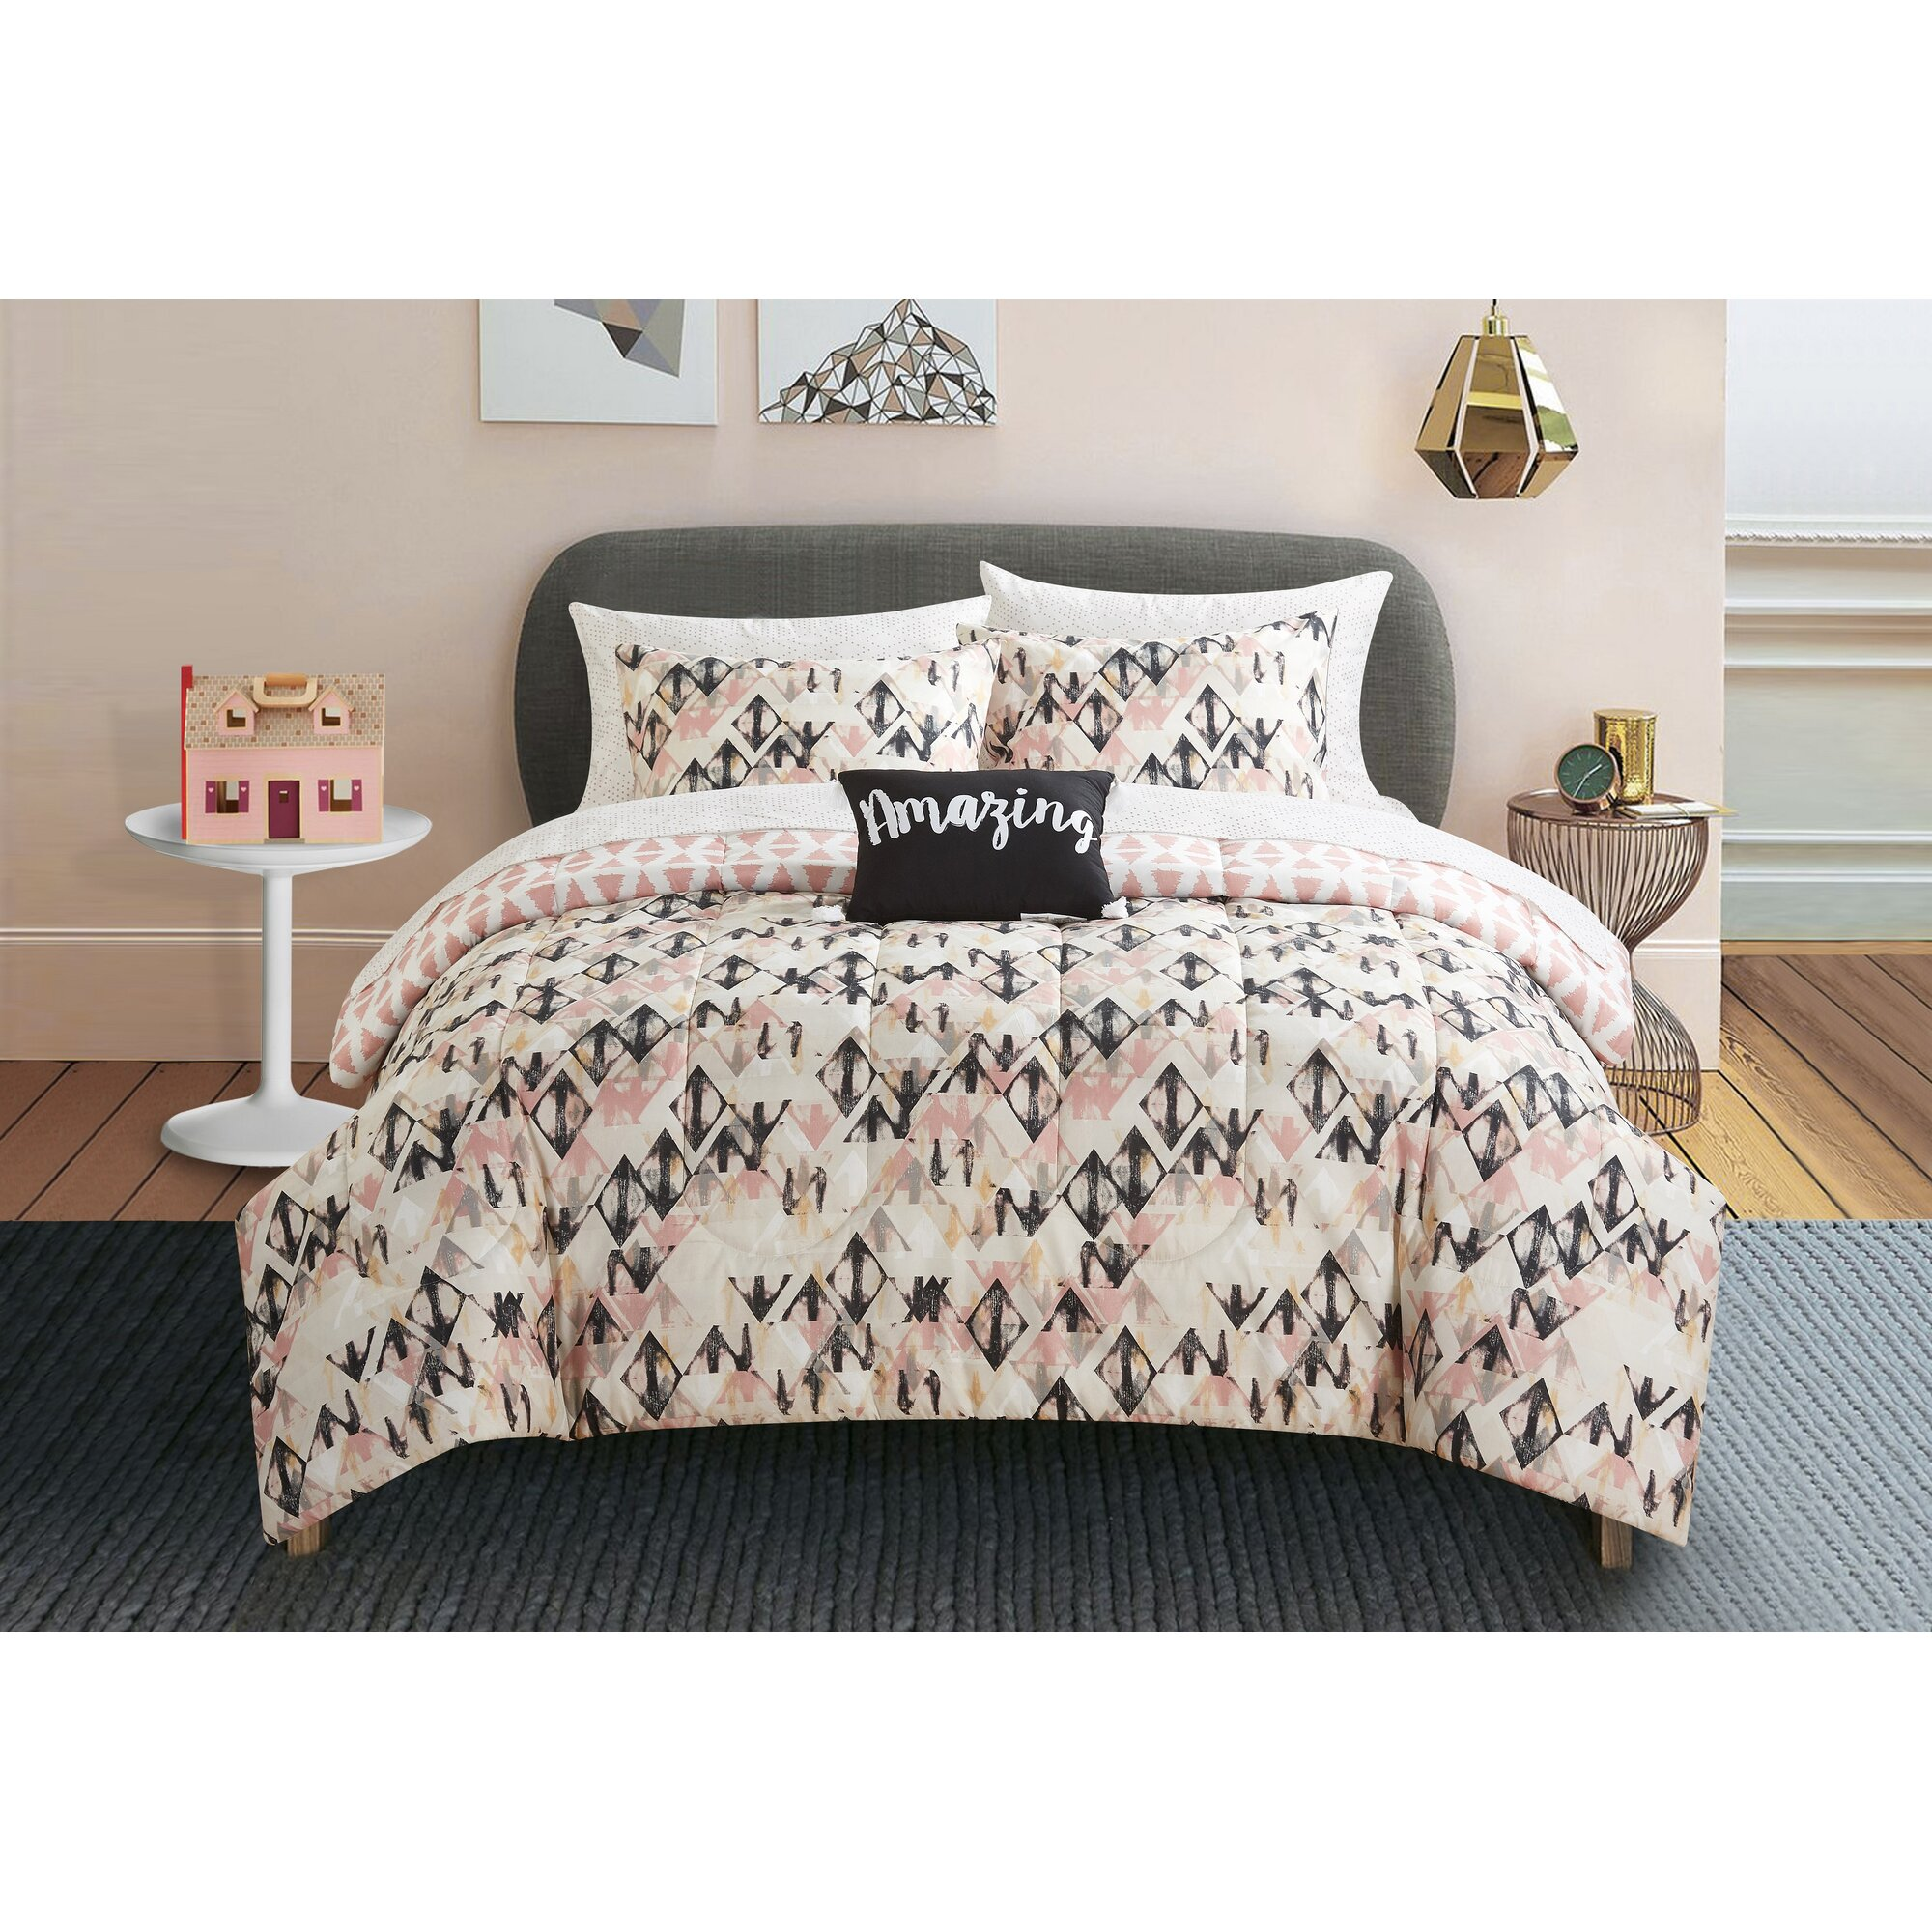 c king size nordstrom bed home marimekko bedding